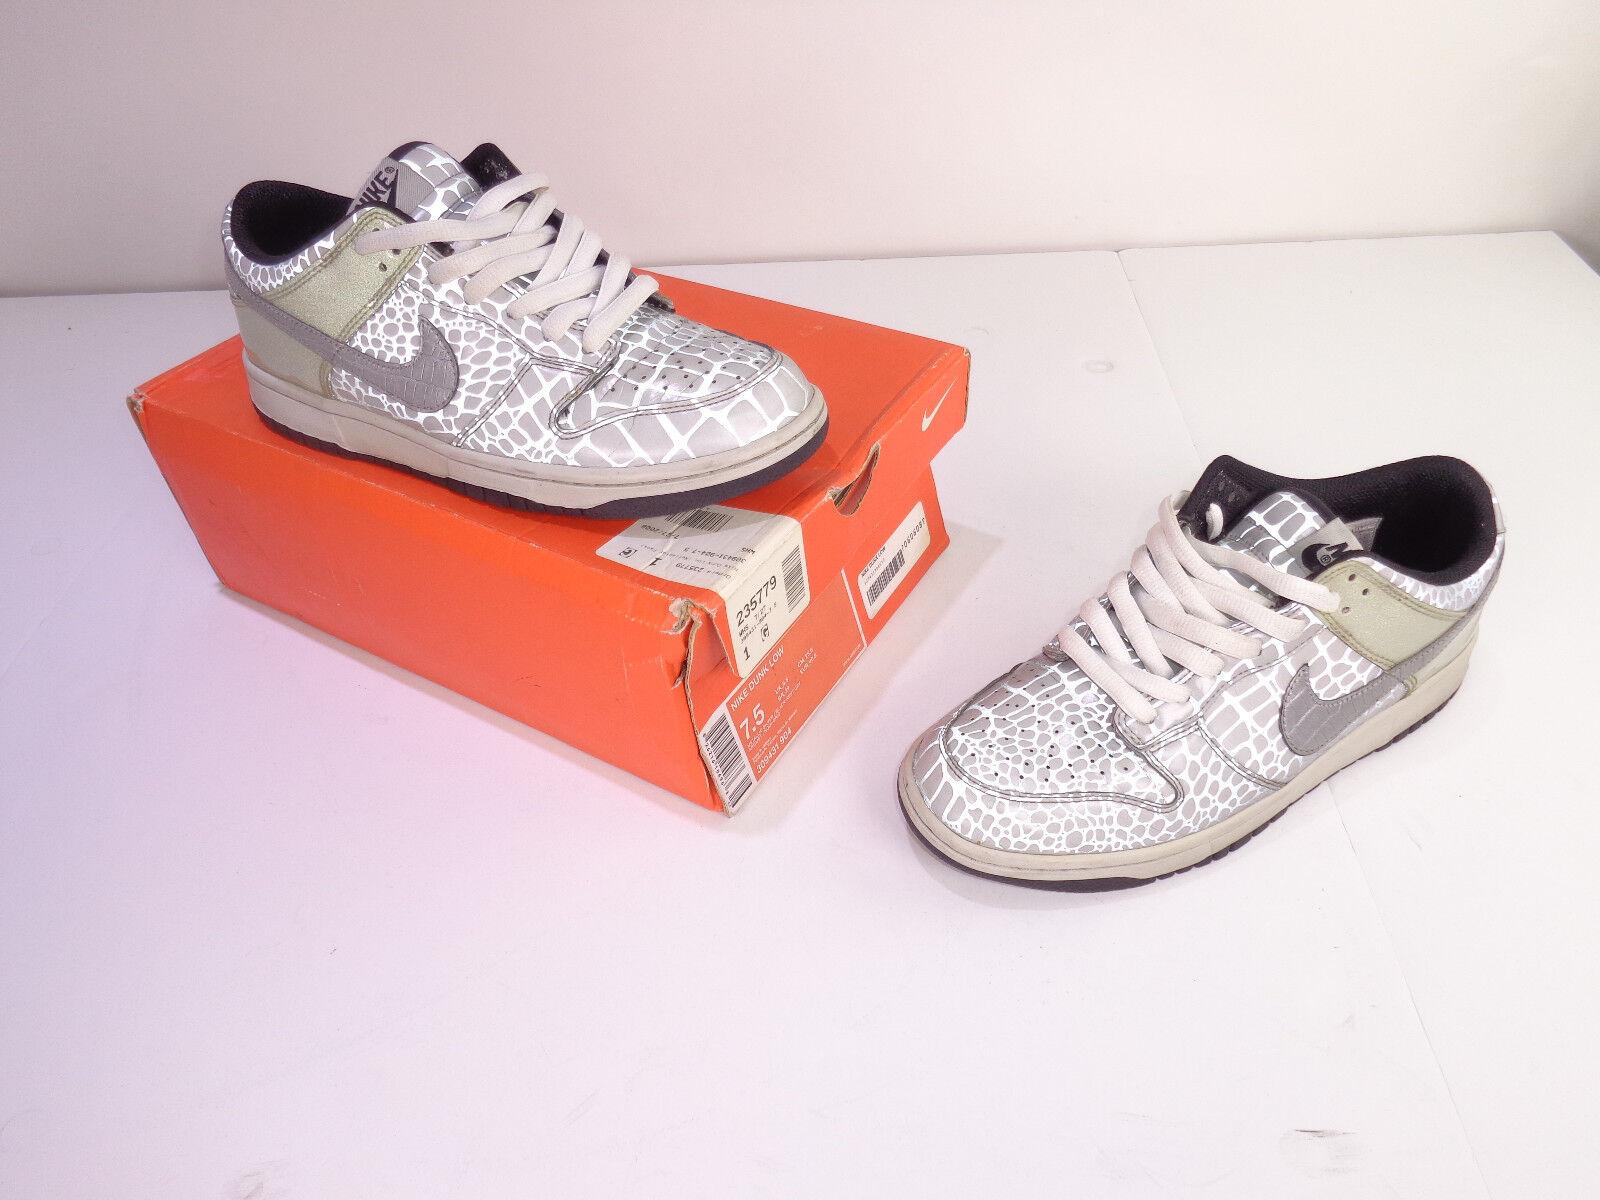 Men's Nike Dunk Low Reflector shoes 309431-904 Metallic Silver Black Grey Sz 7.5